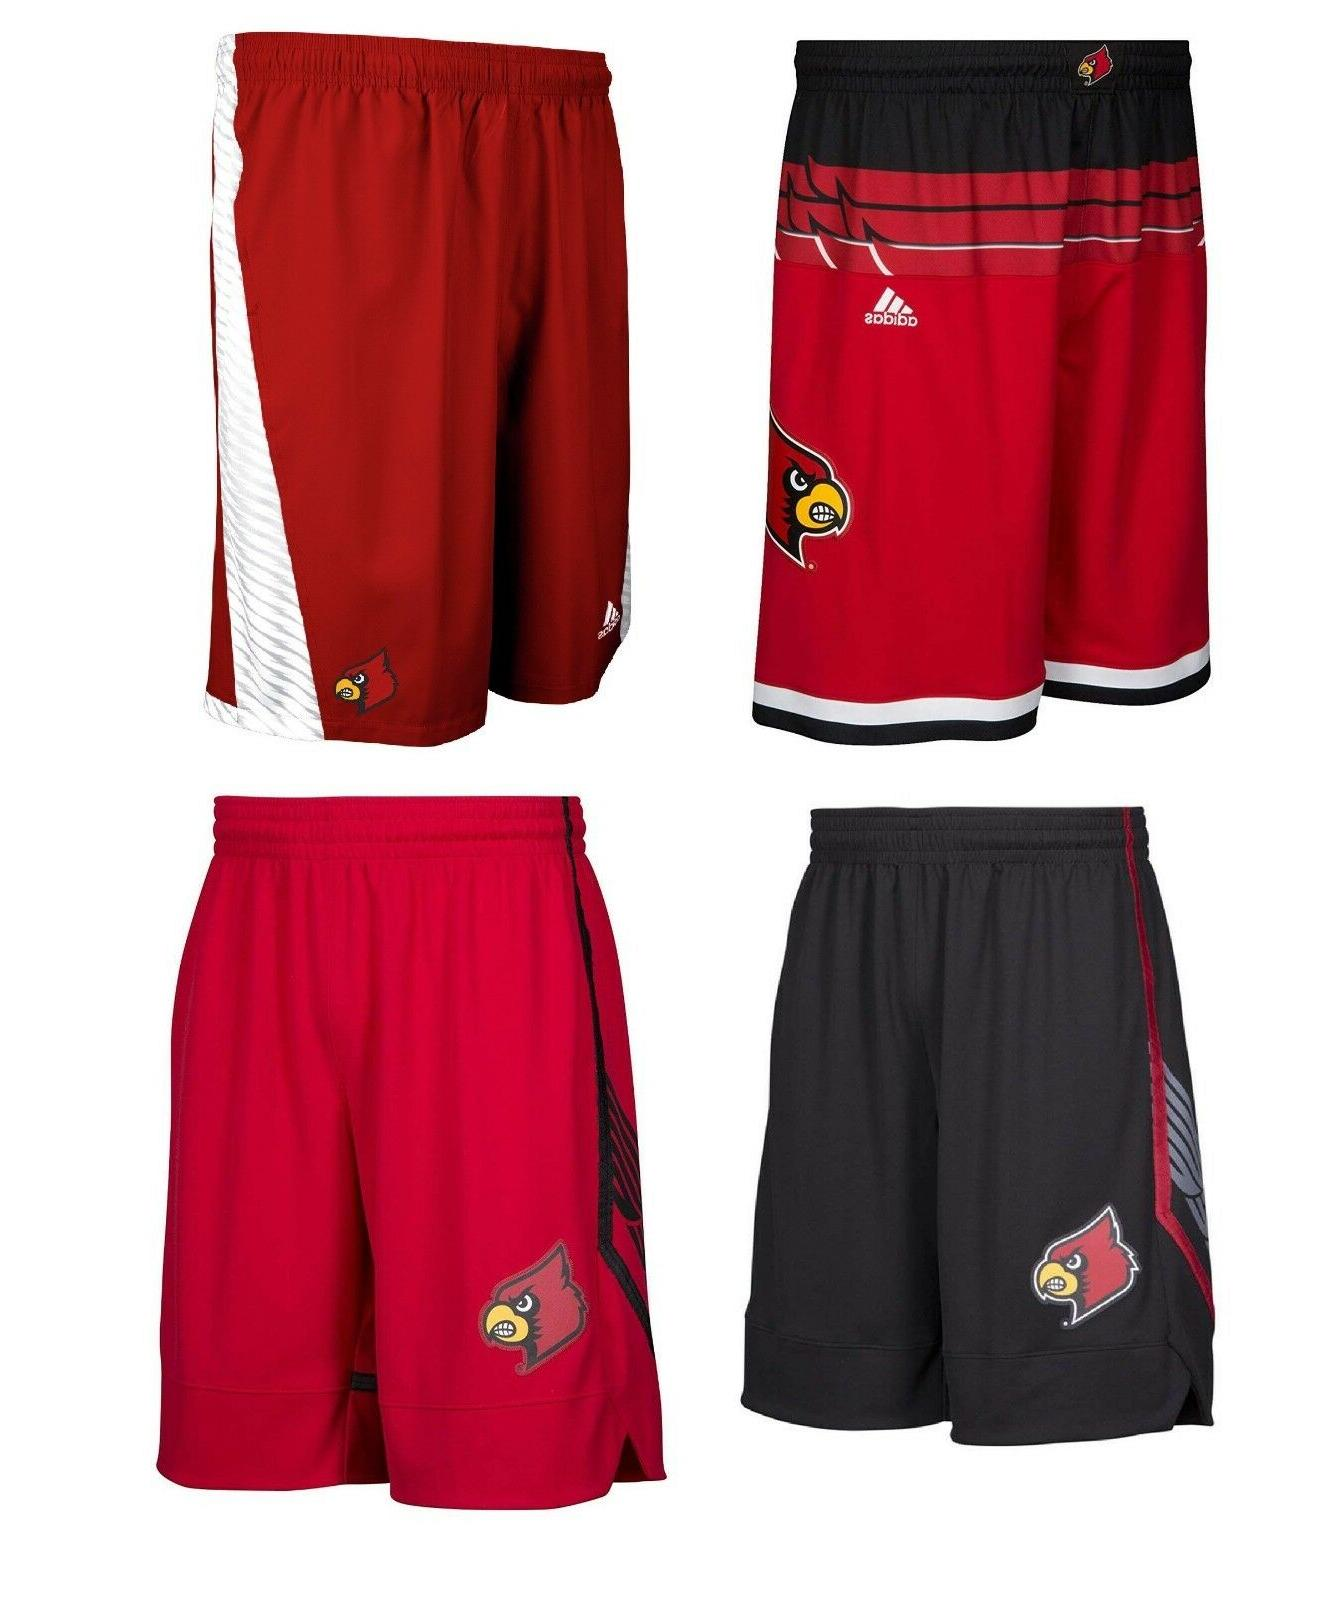 new mens ncaa louisville cardinals on court